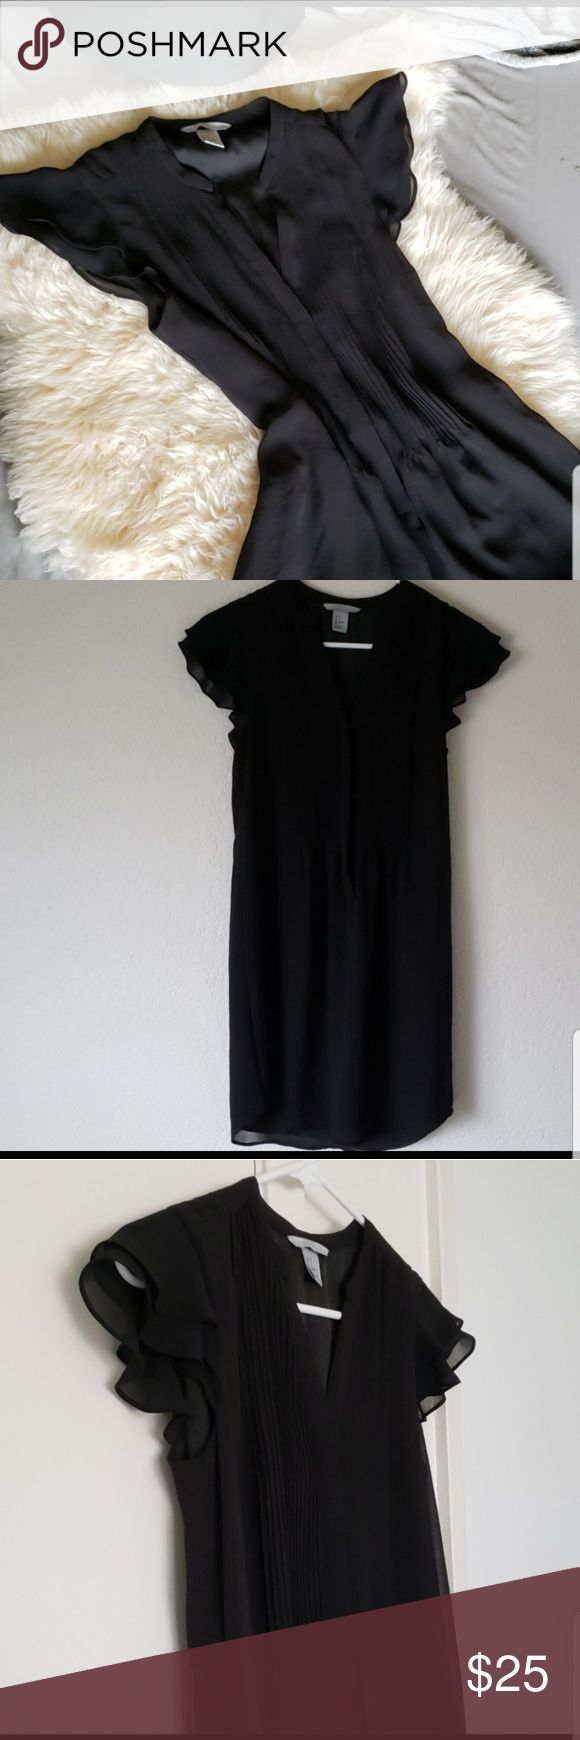 H&M Little black dress Perfect little black dress Features sheer ruffle sleeves ... 1